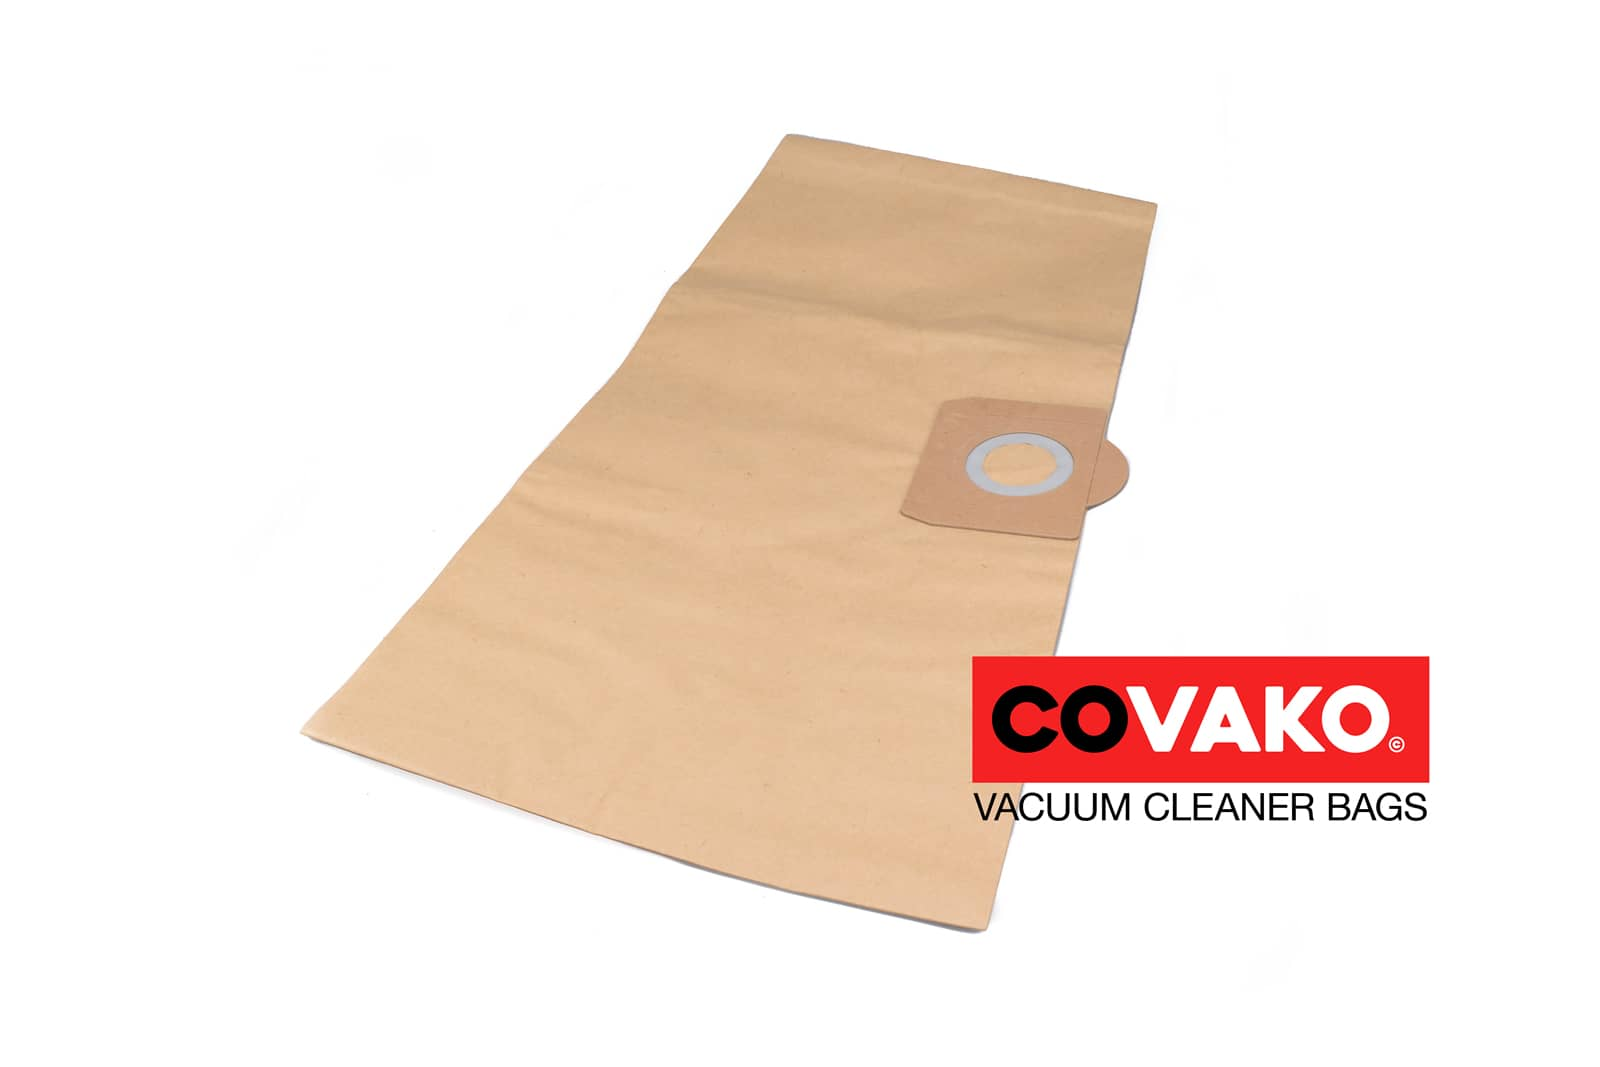 Soteco Dakota Compact 101 Spot / Papier - Soteco stofzuigerzakken